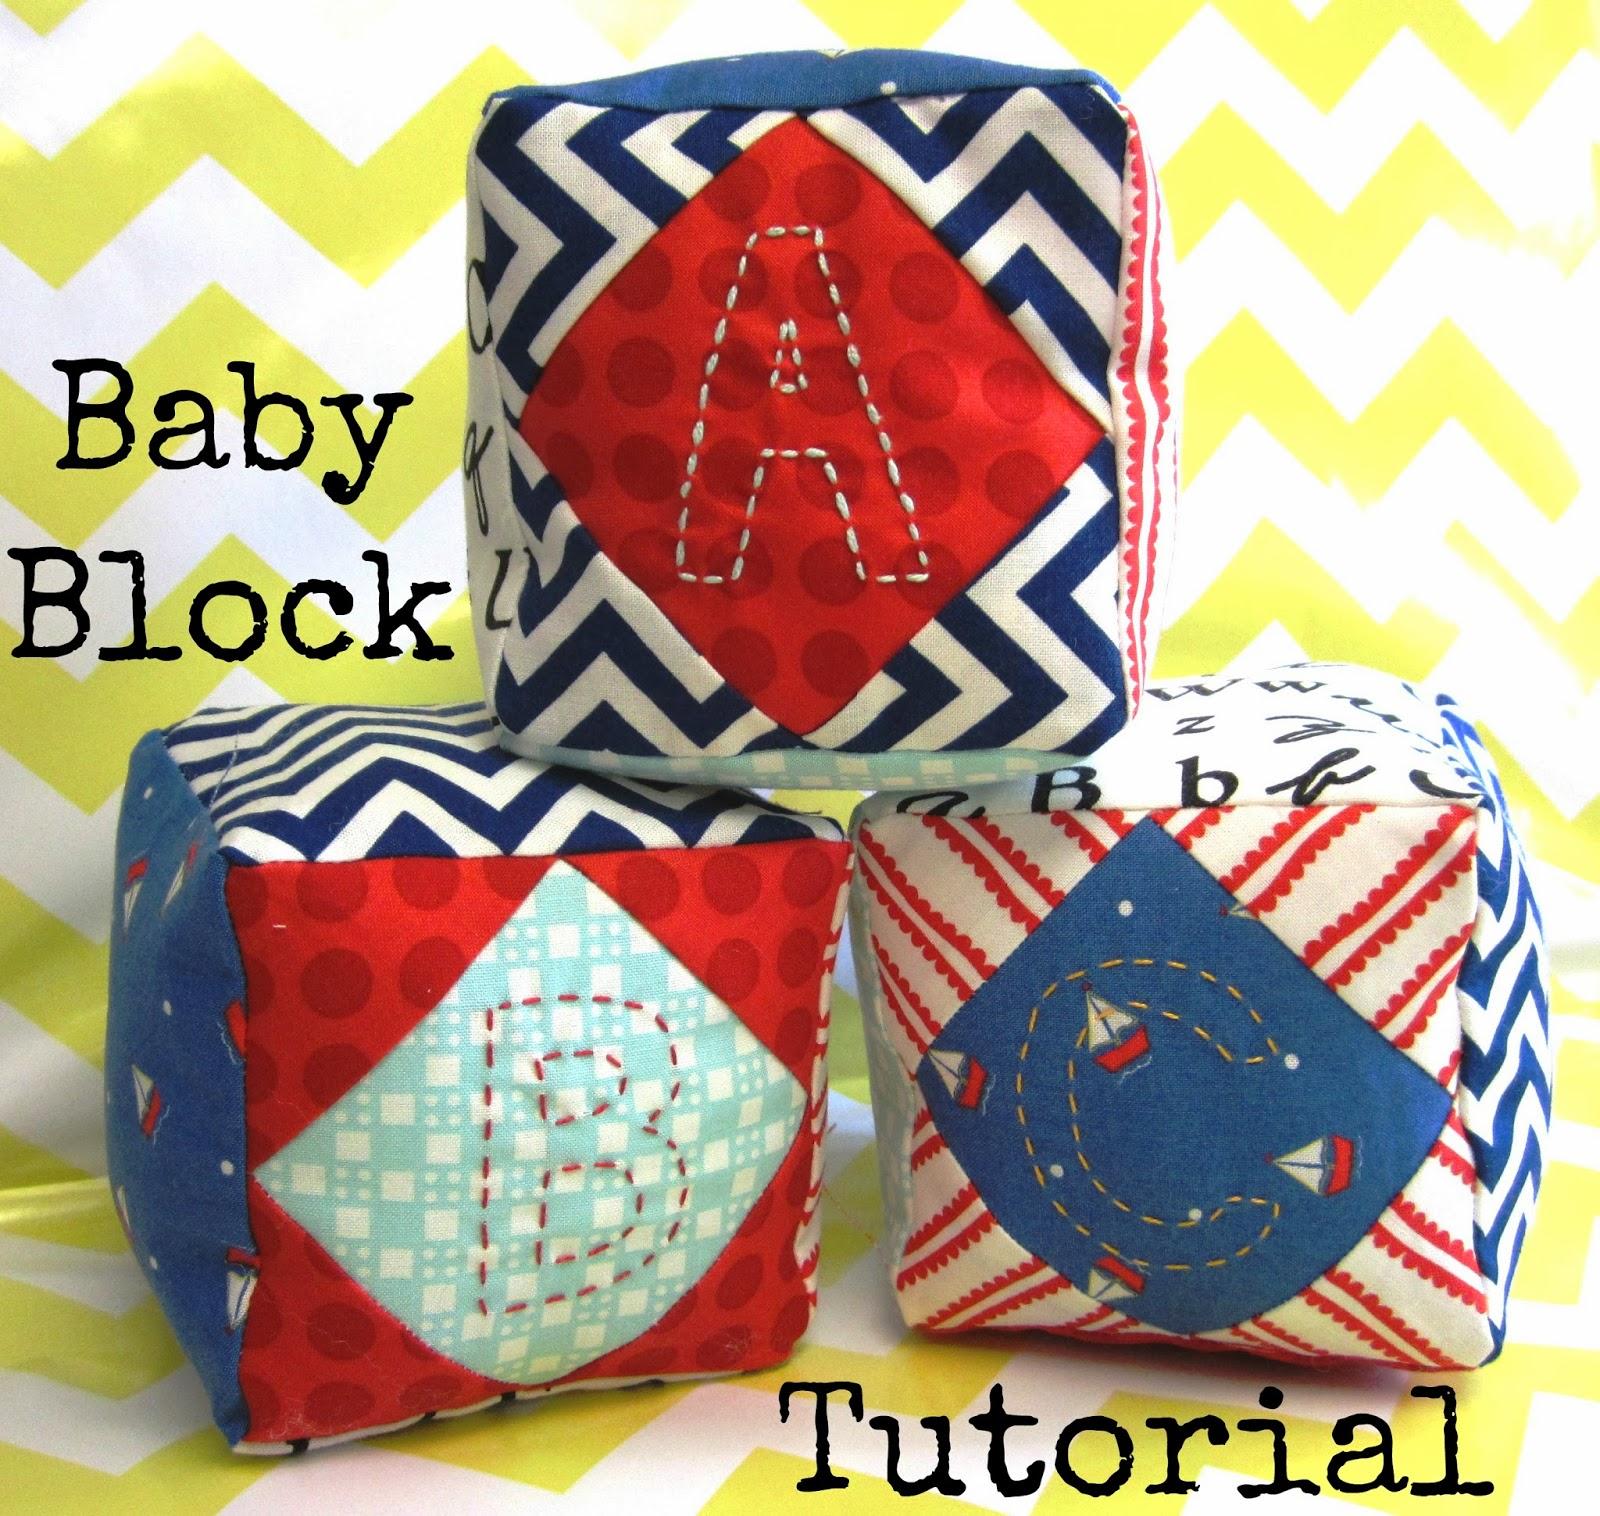 Sew Lux Fabric Designer Challenge: Baby Blocks